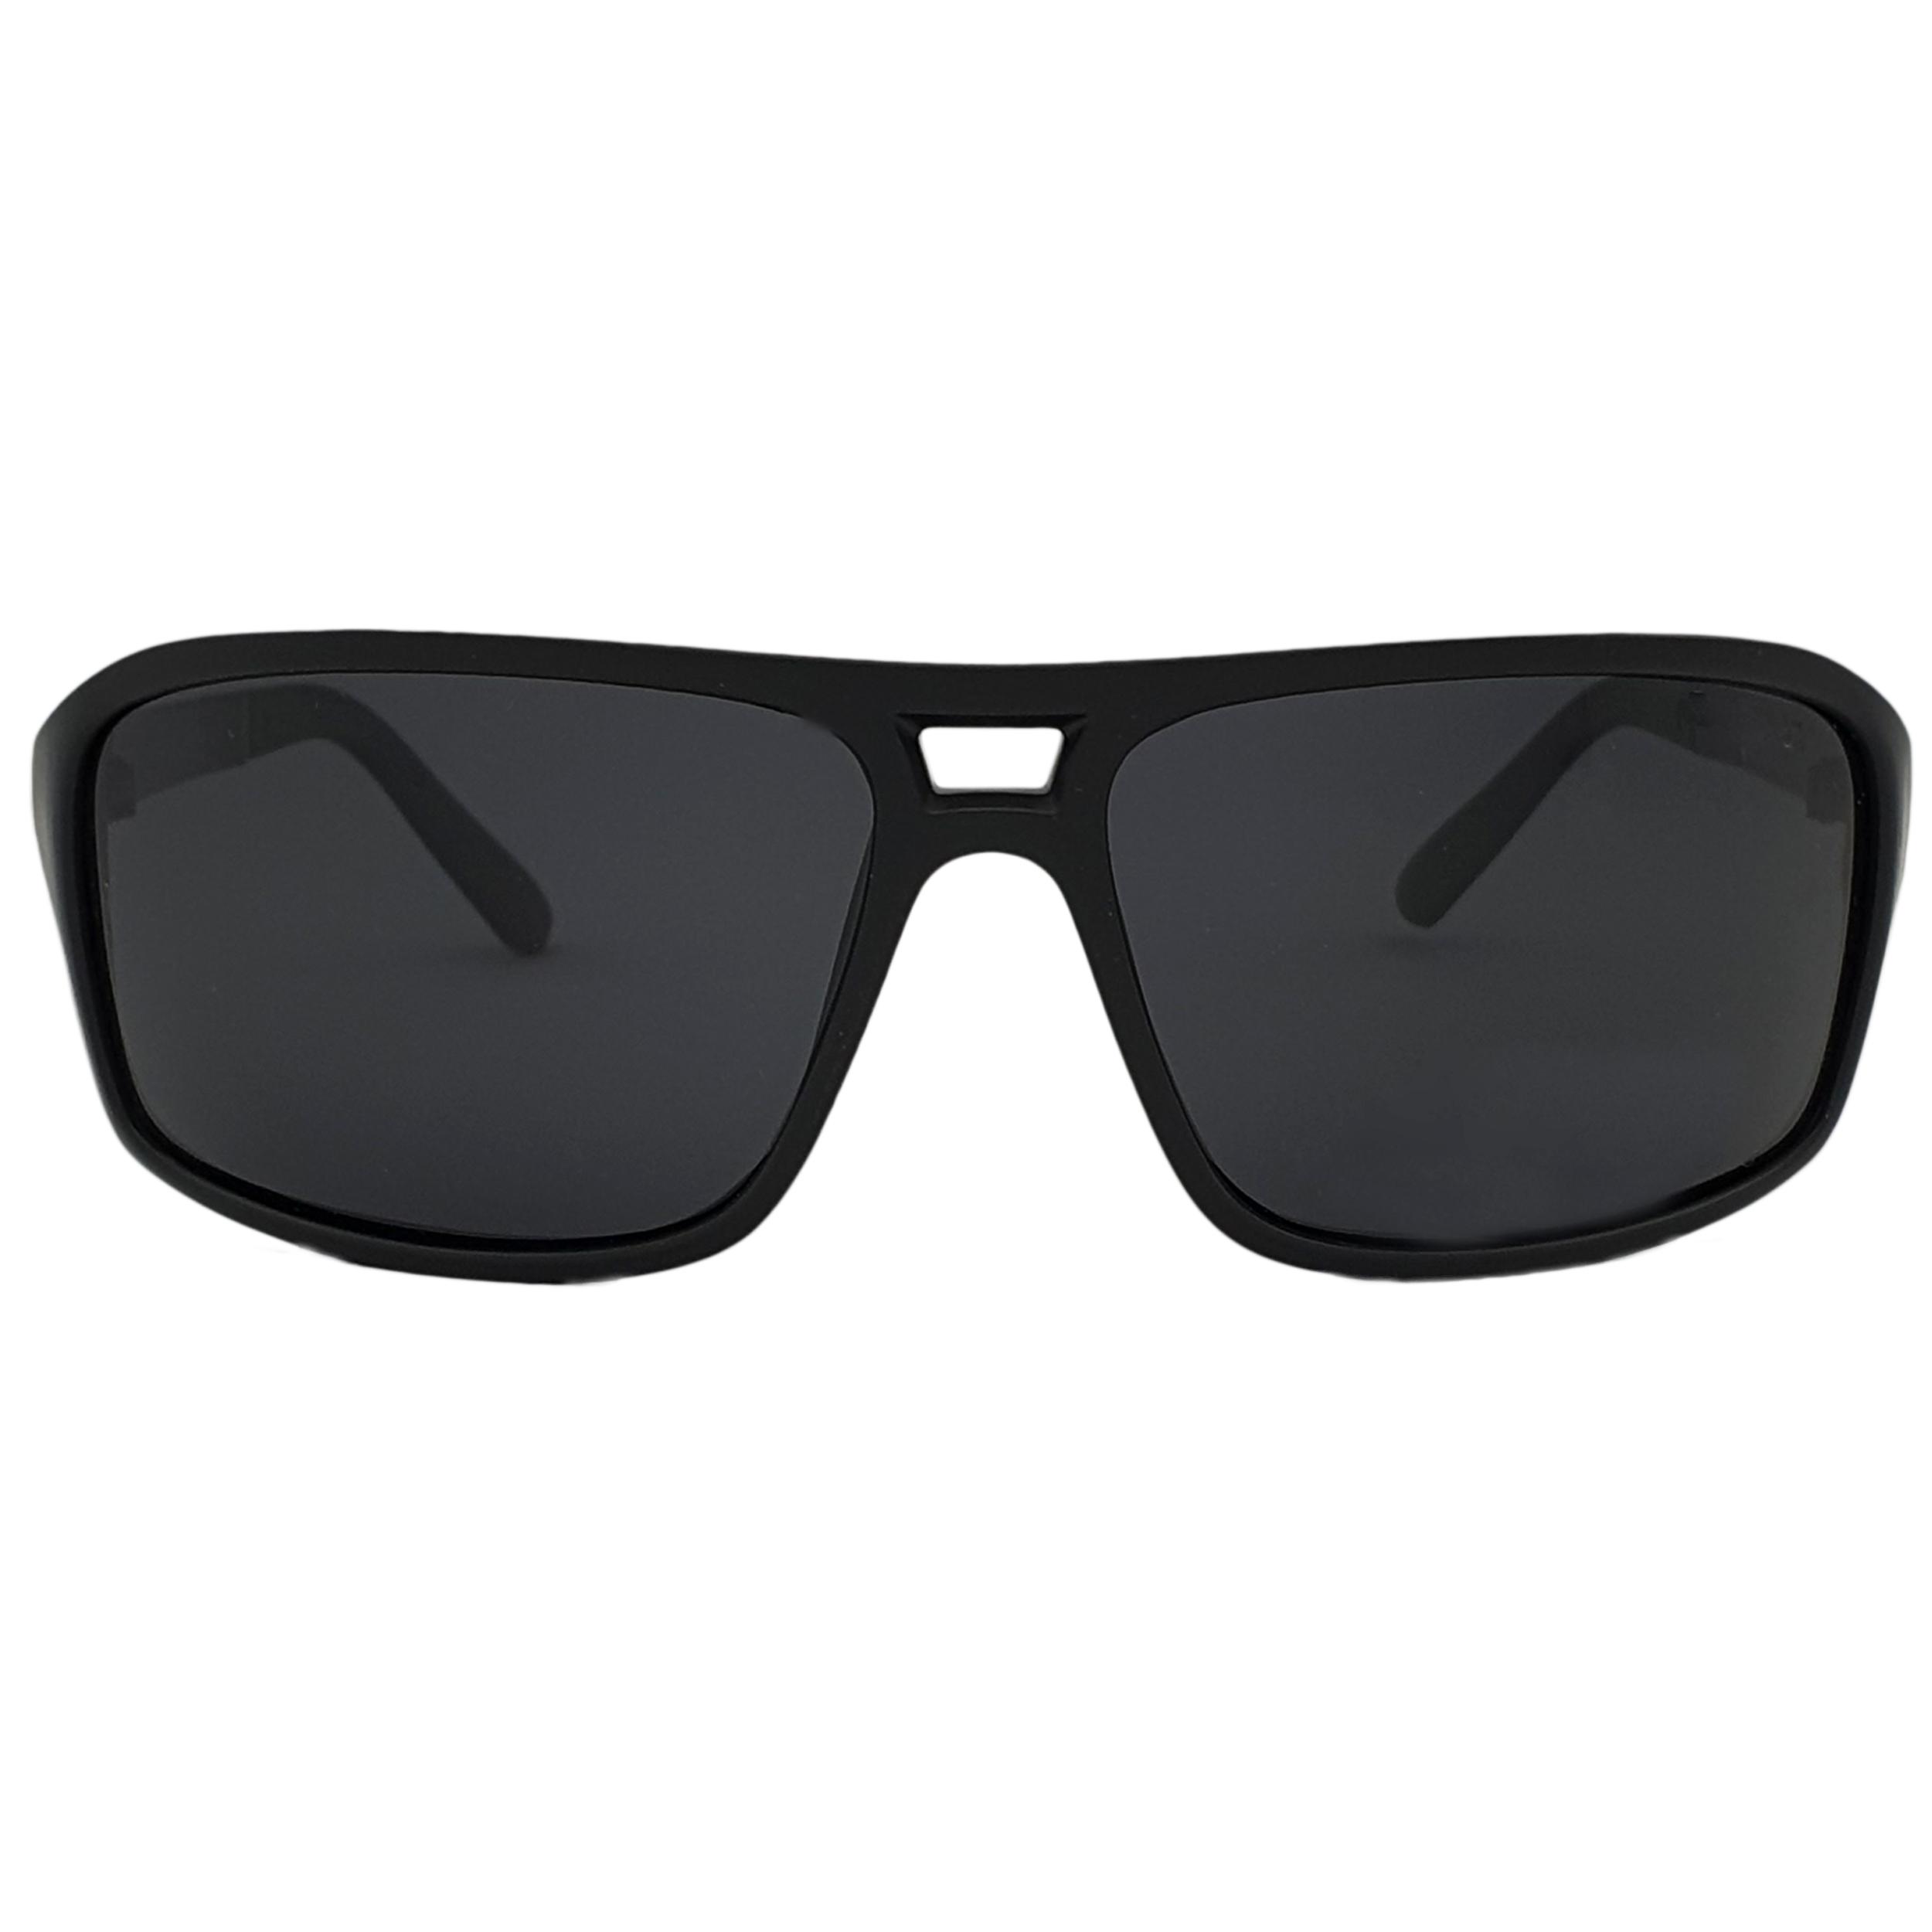 عینک آفتابی  کد P9816